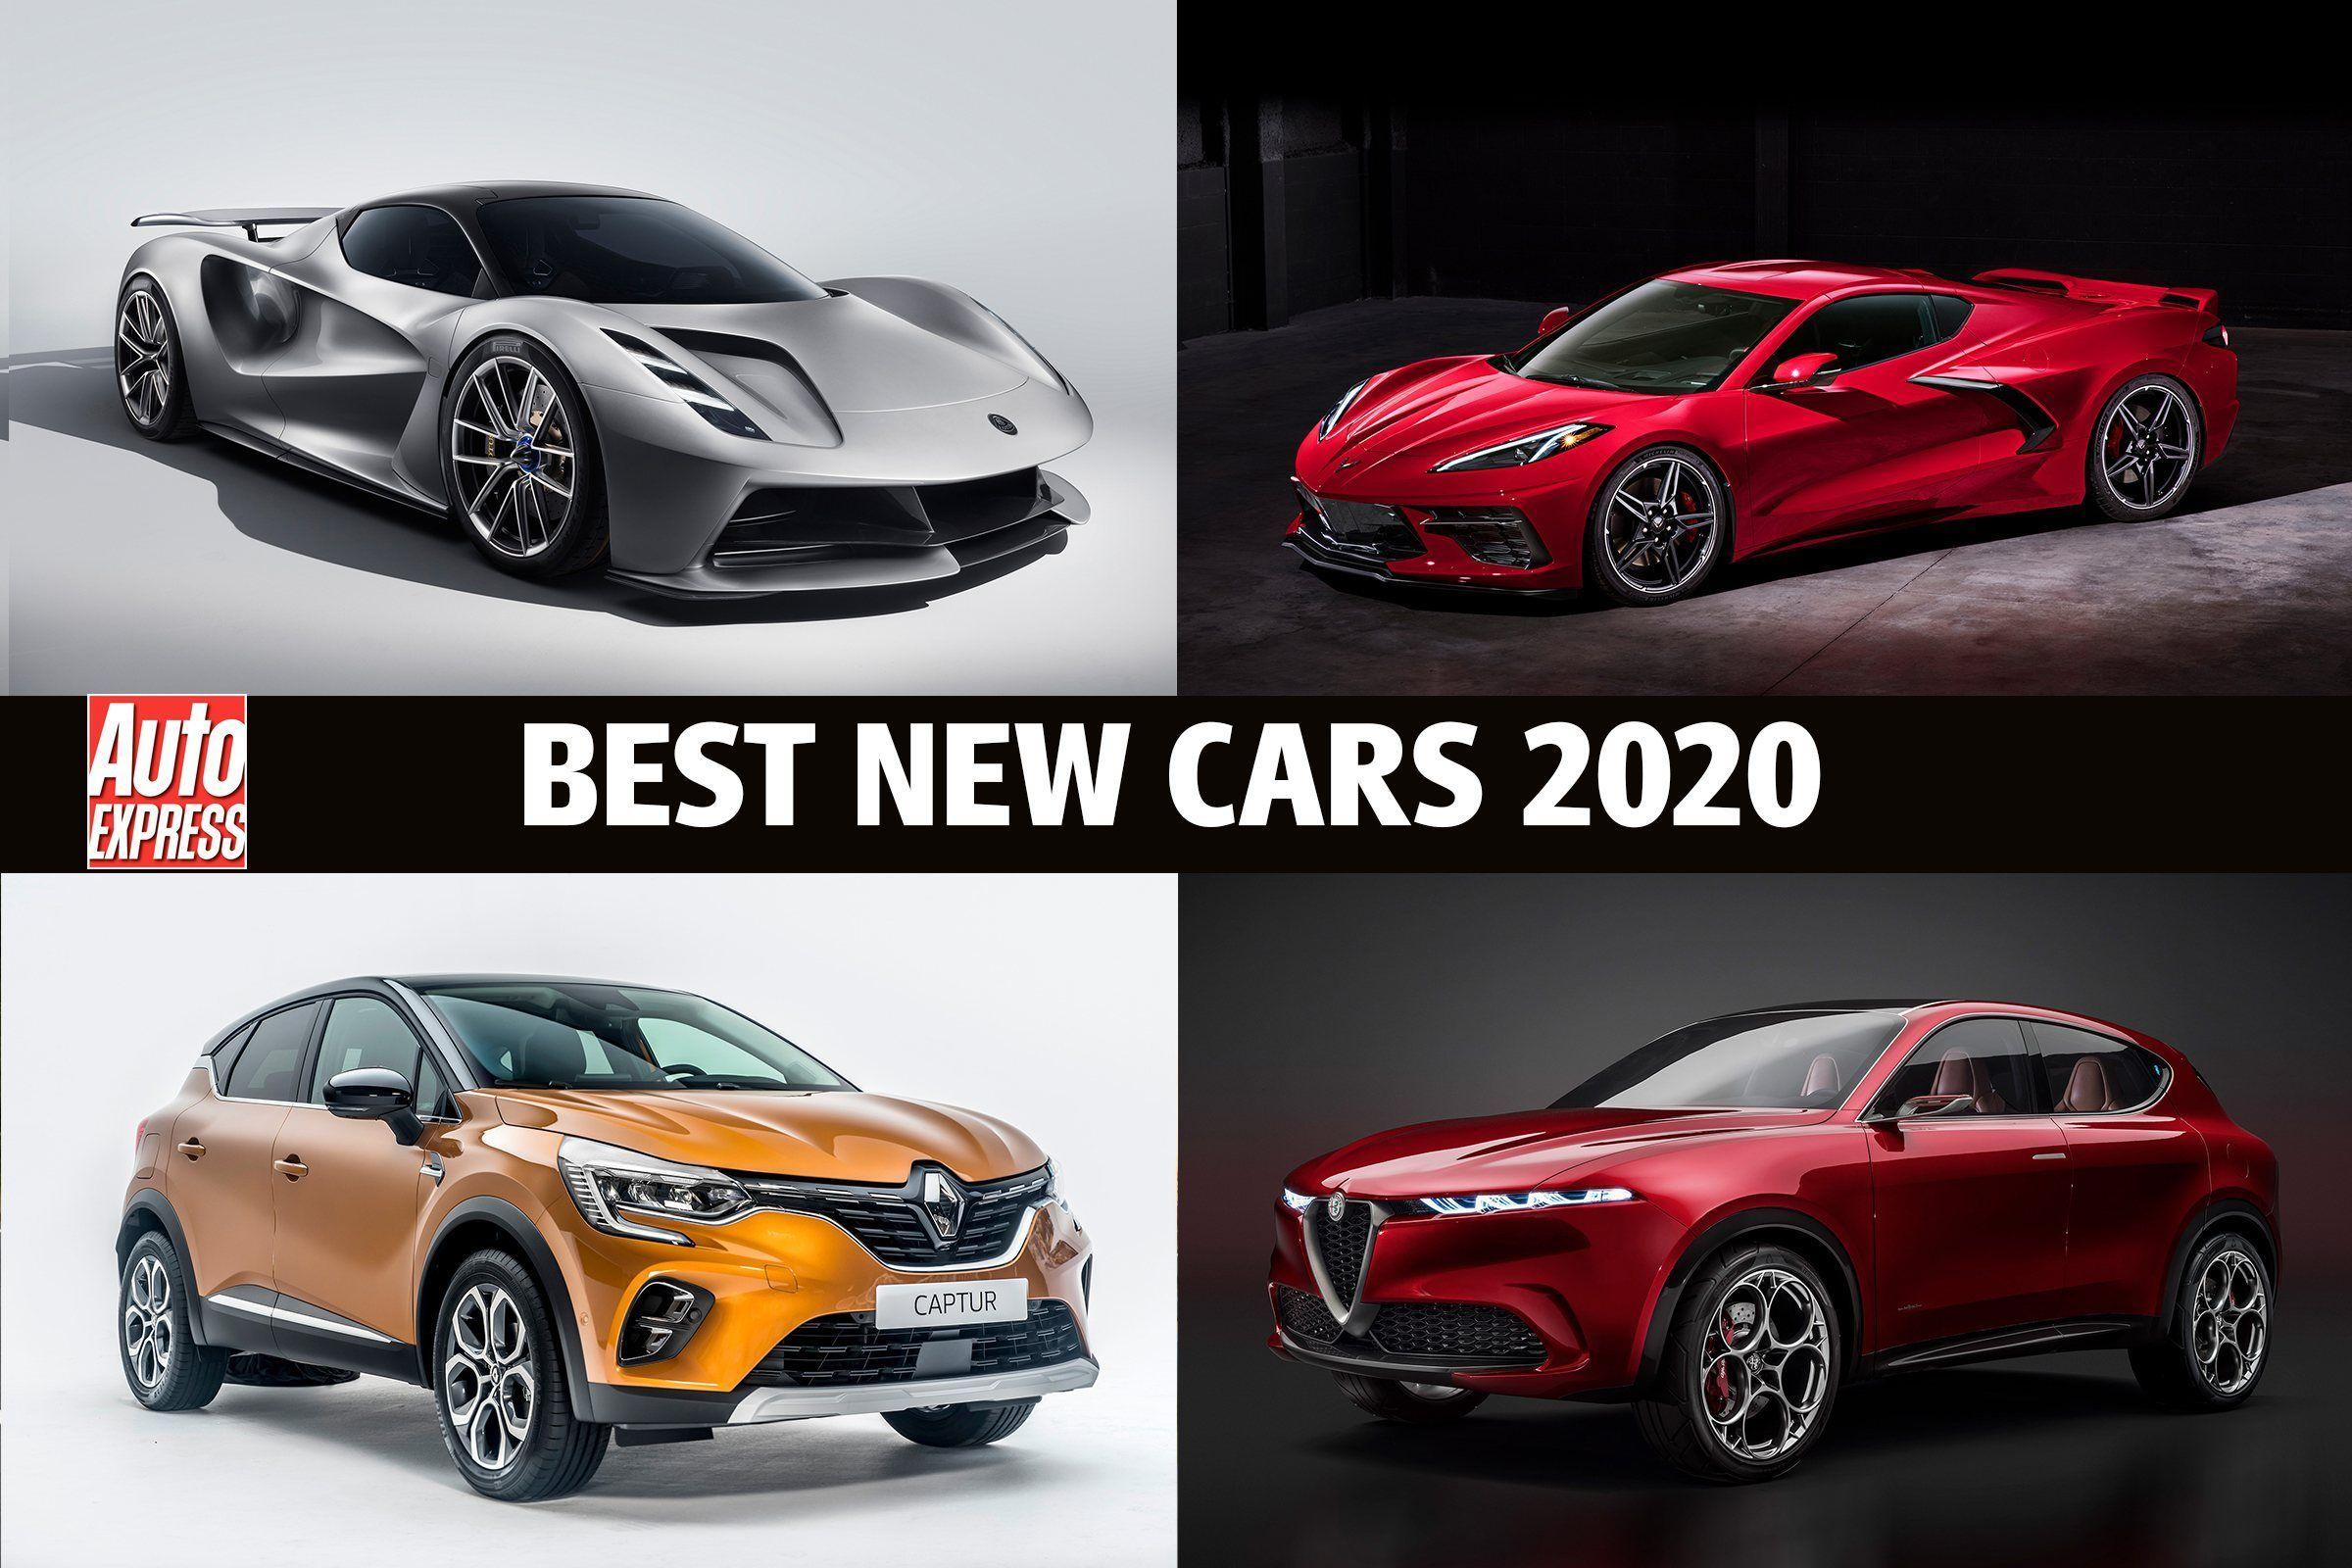 2021 Citroen C4 New Concept In 2020 Hybrid Car Cars Uk Best New Cars